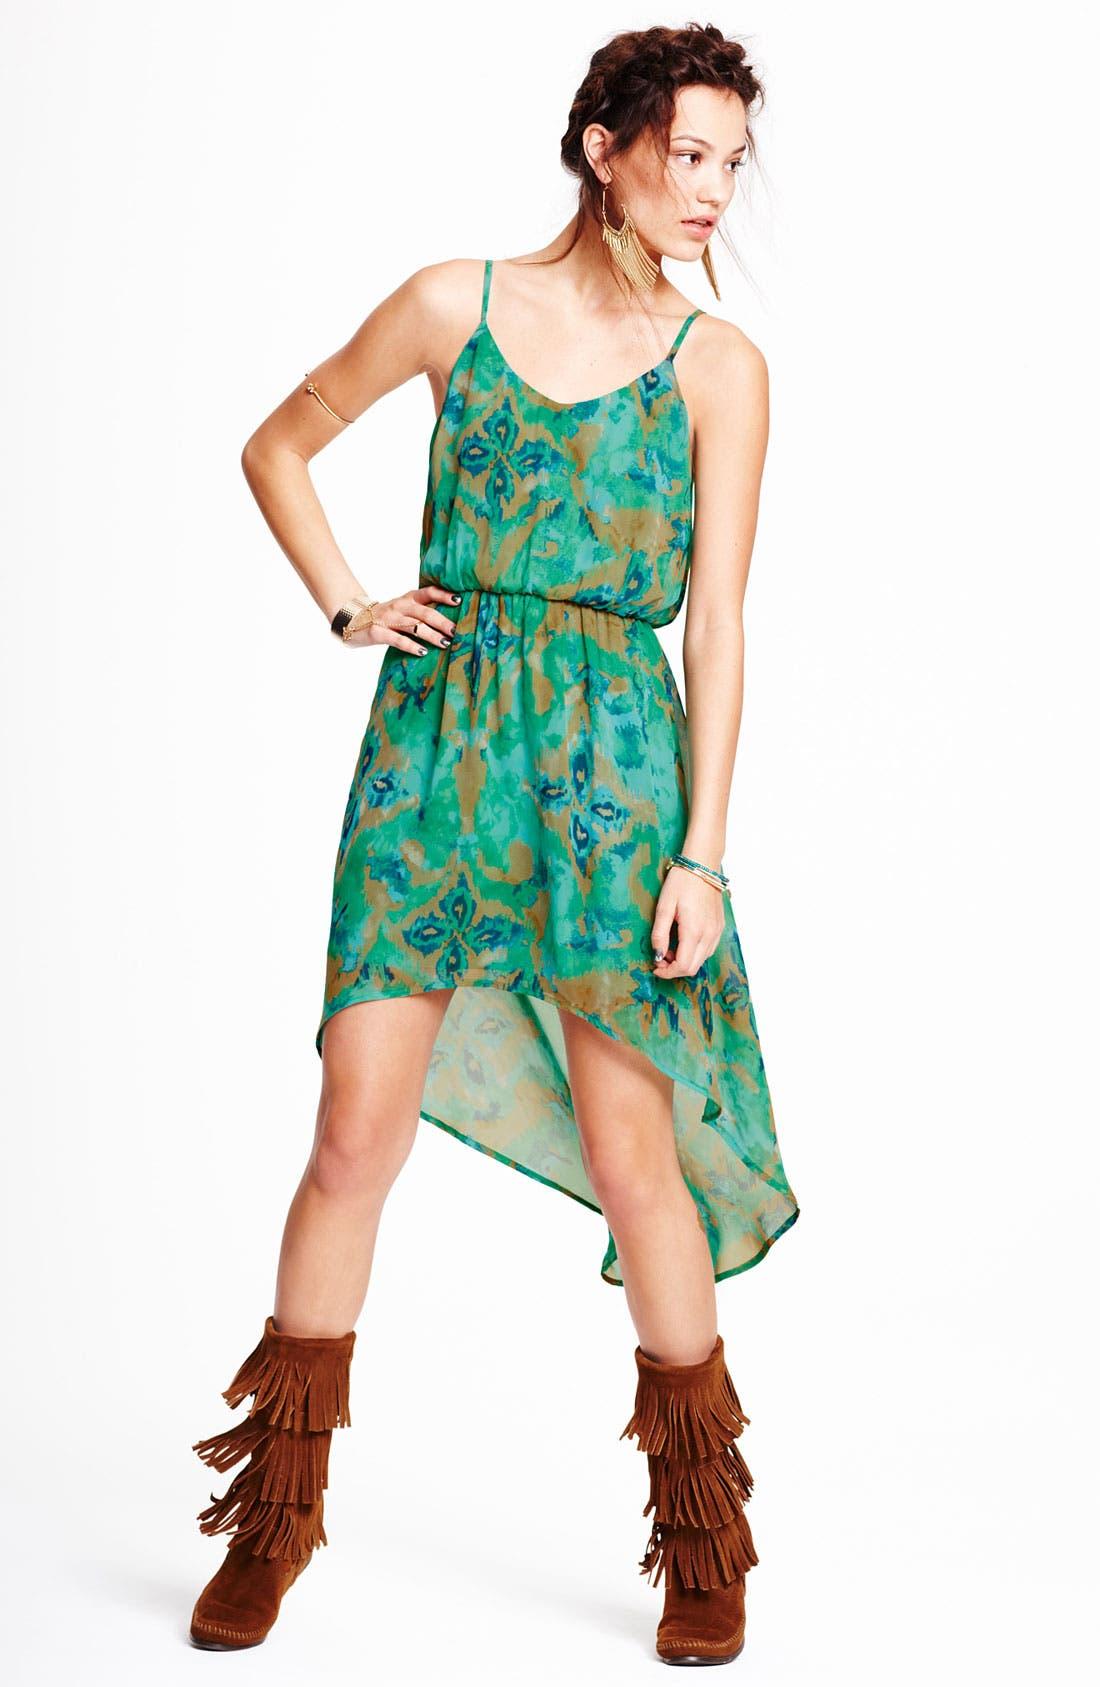 Main Image - Lush Dress & Accessories